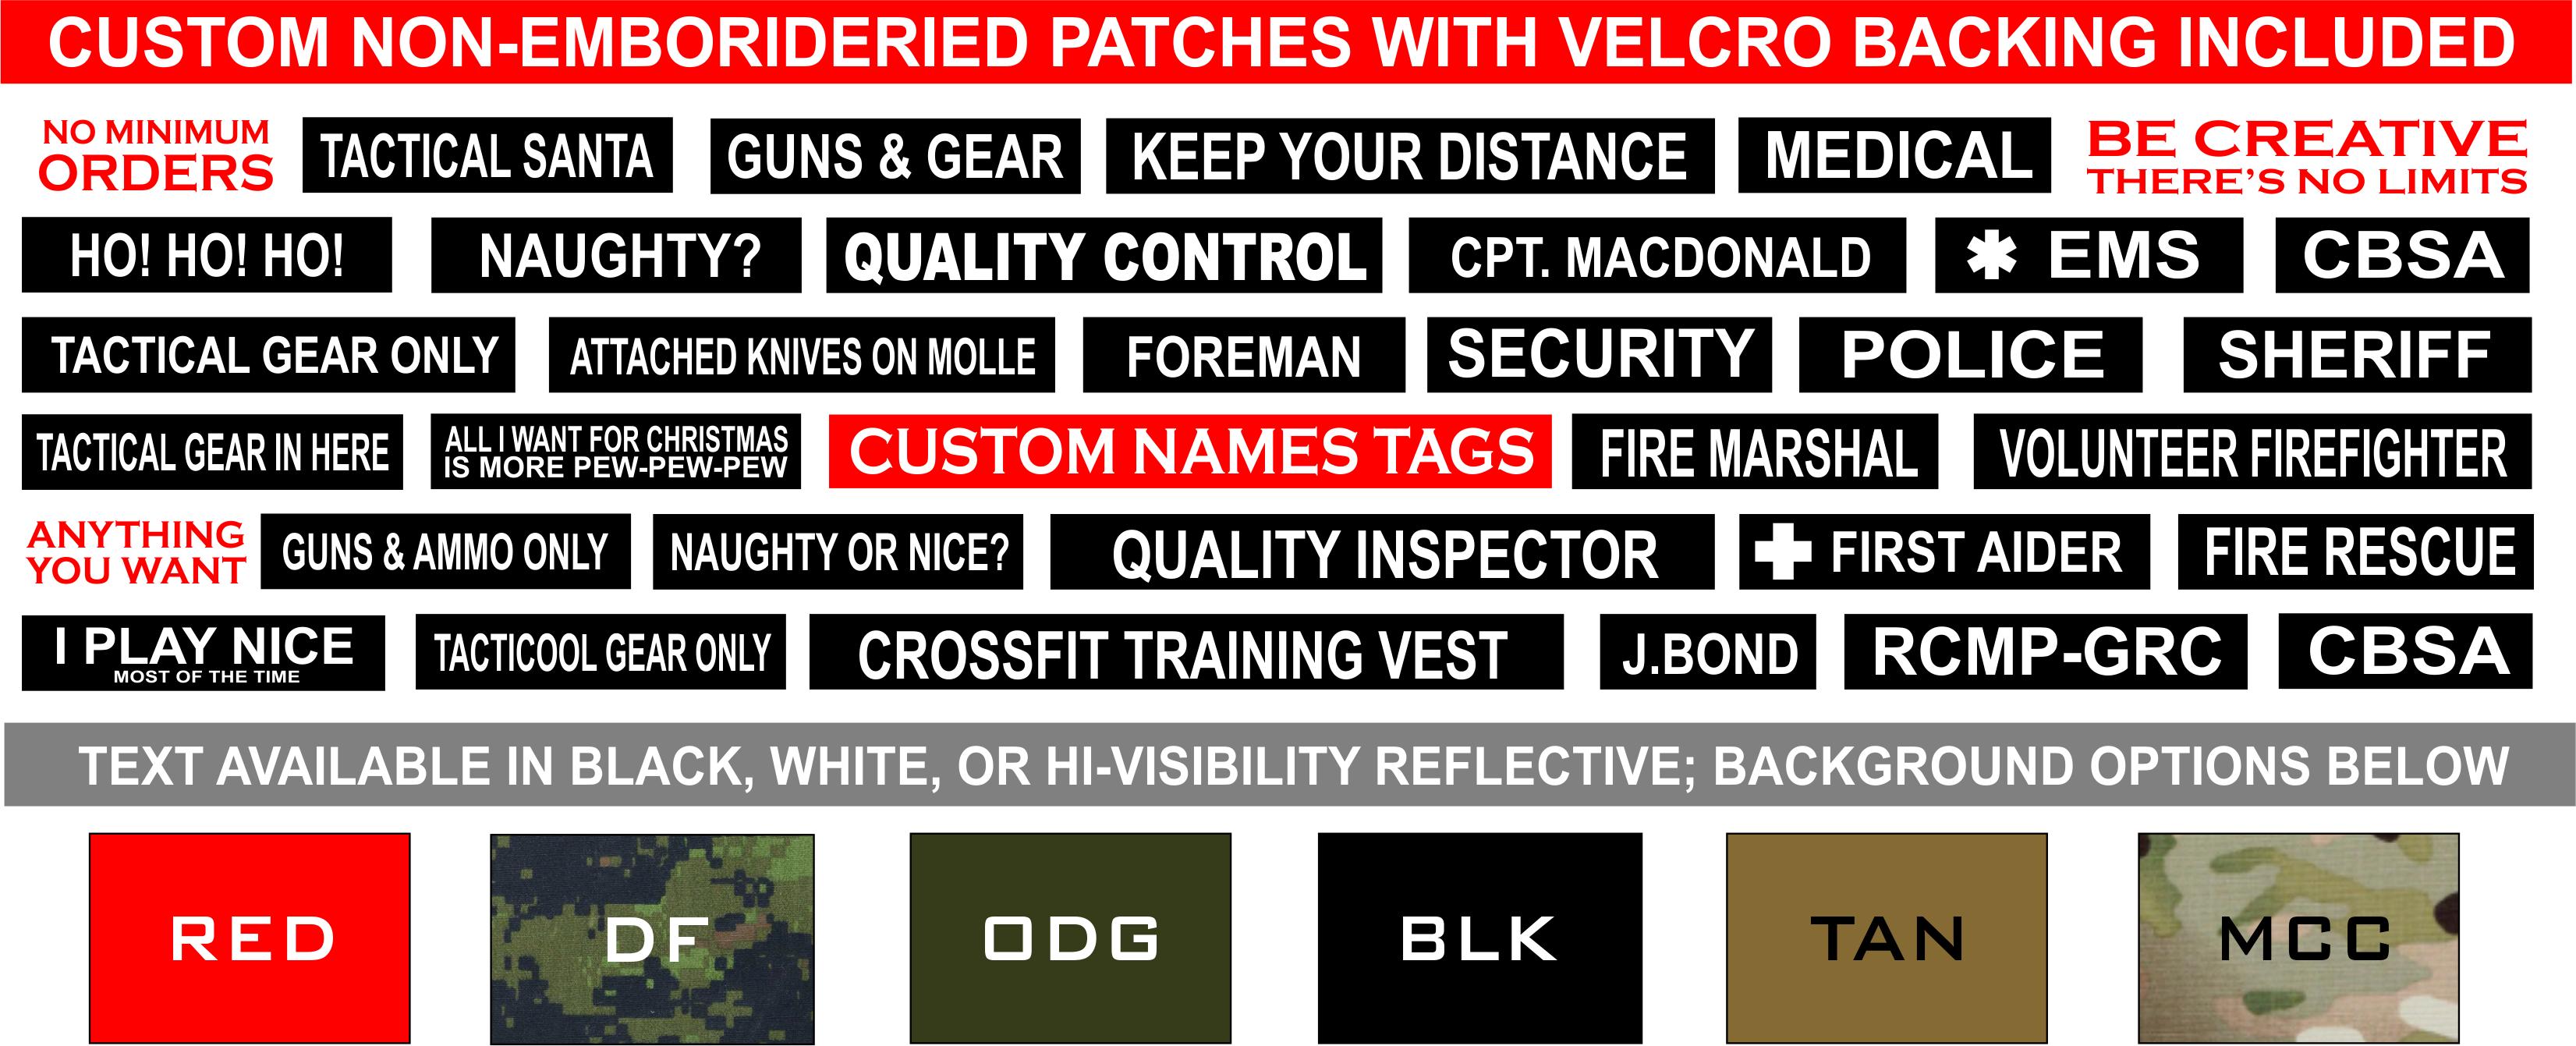 tic-custom-patch-header-0-.png